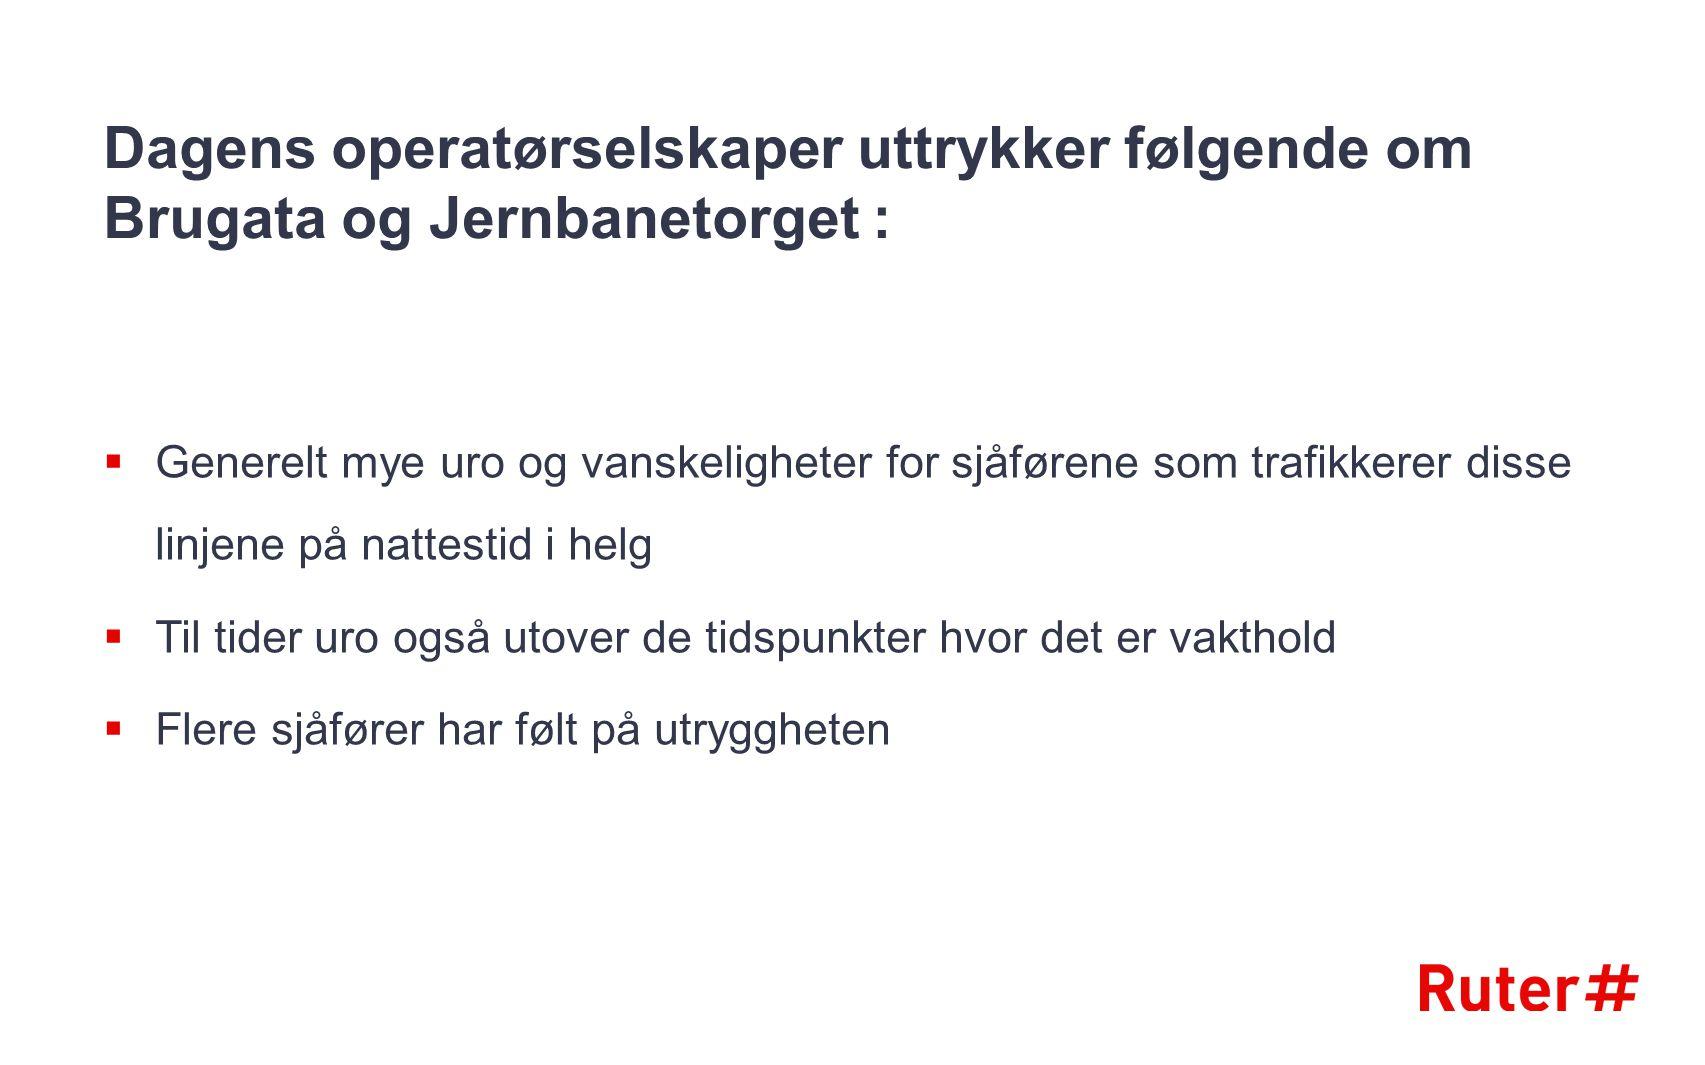 Dagens operatørselskaper uttrykker følgende om Brugata og Jernbanetorget :